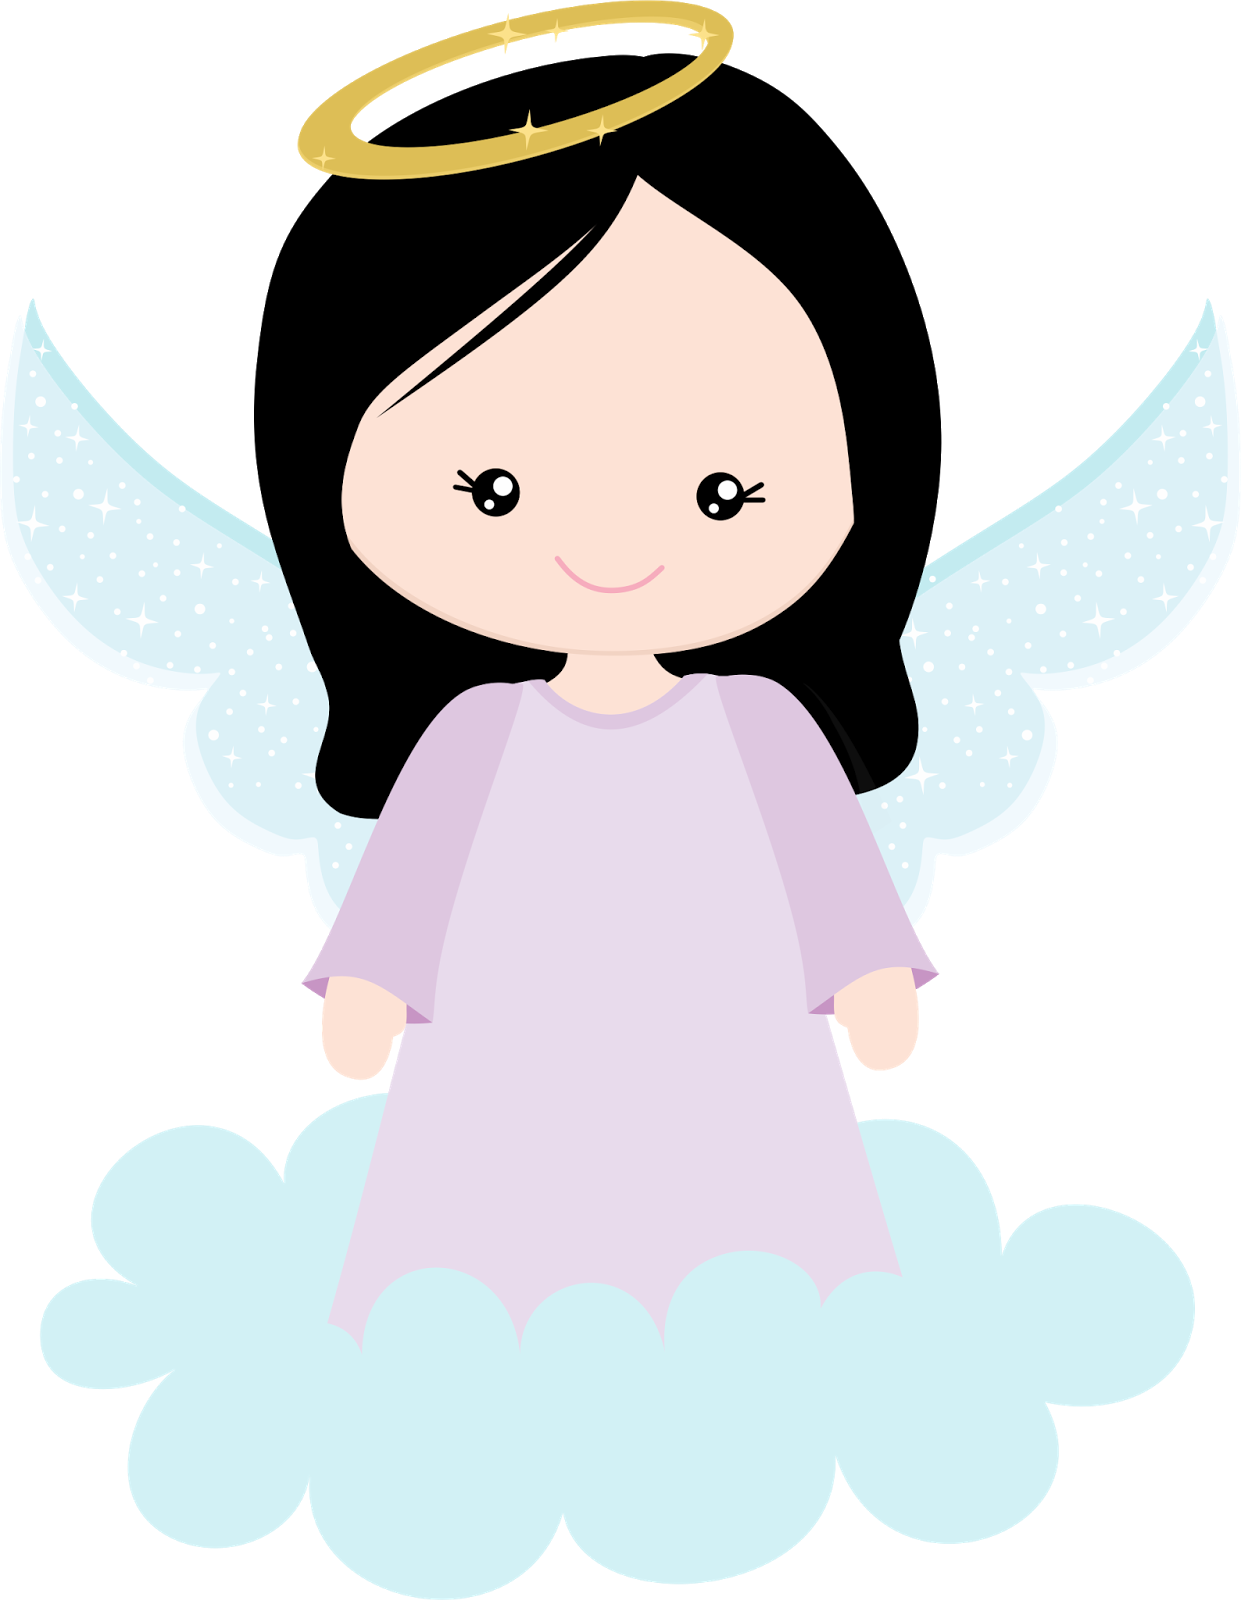 Help Festas e Personalizados Anjos PNG : ibqWayLGqxTpl1 from helpfesta.blogspot.com size 1241 x 1600 png 222kB